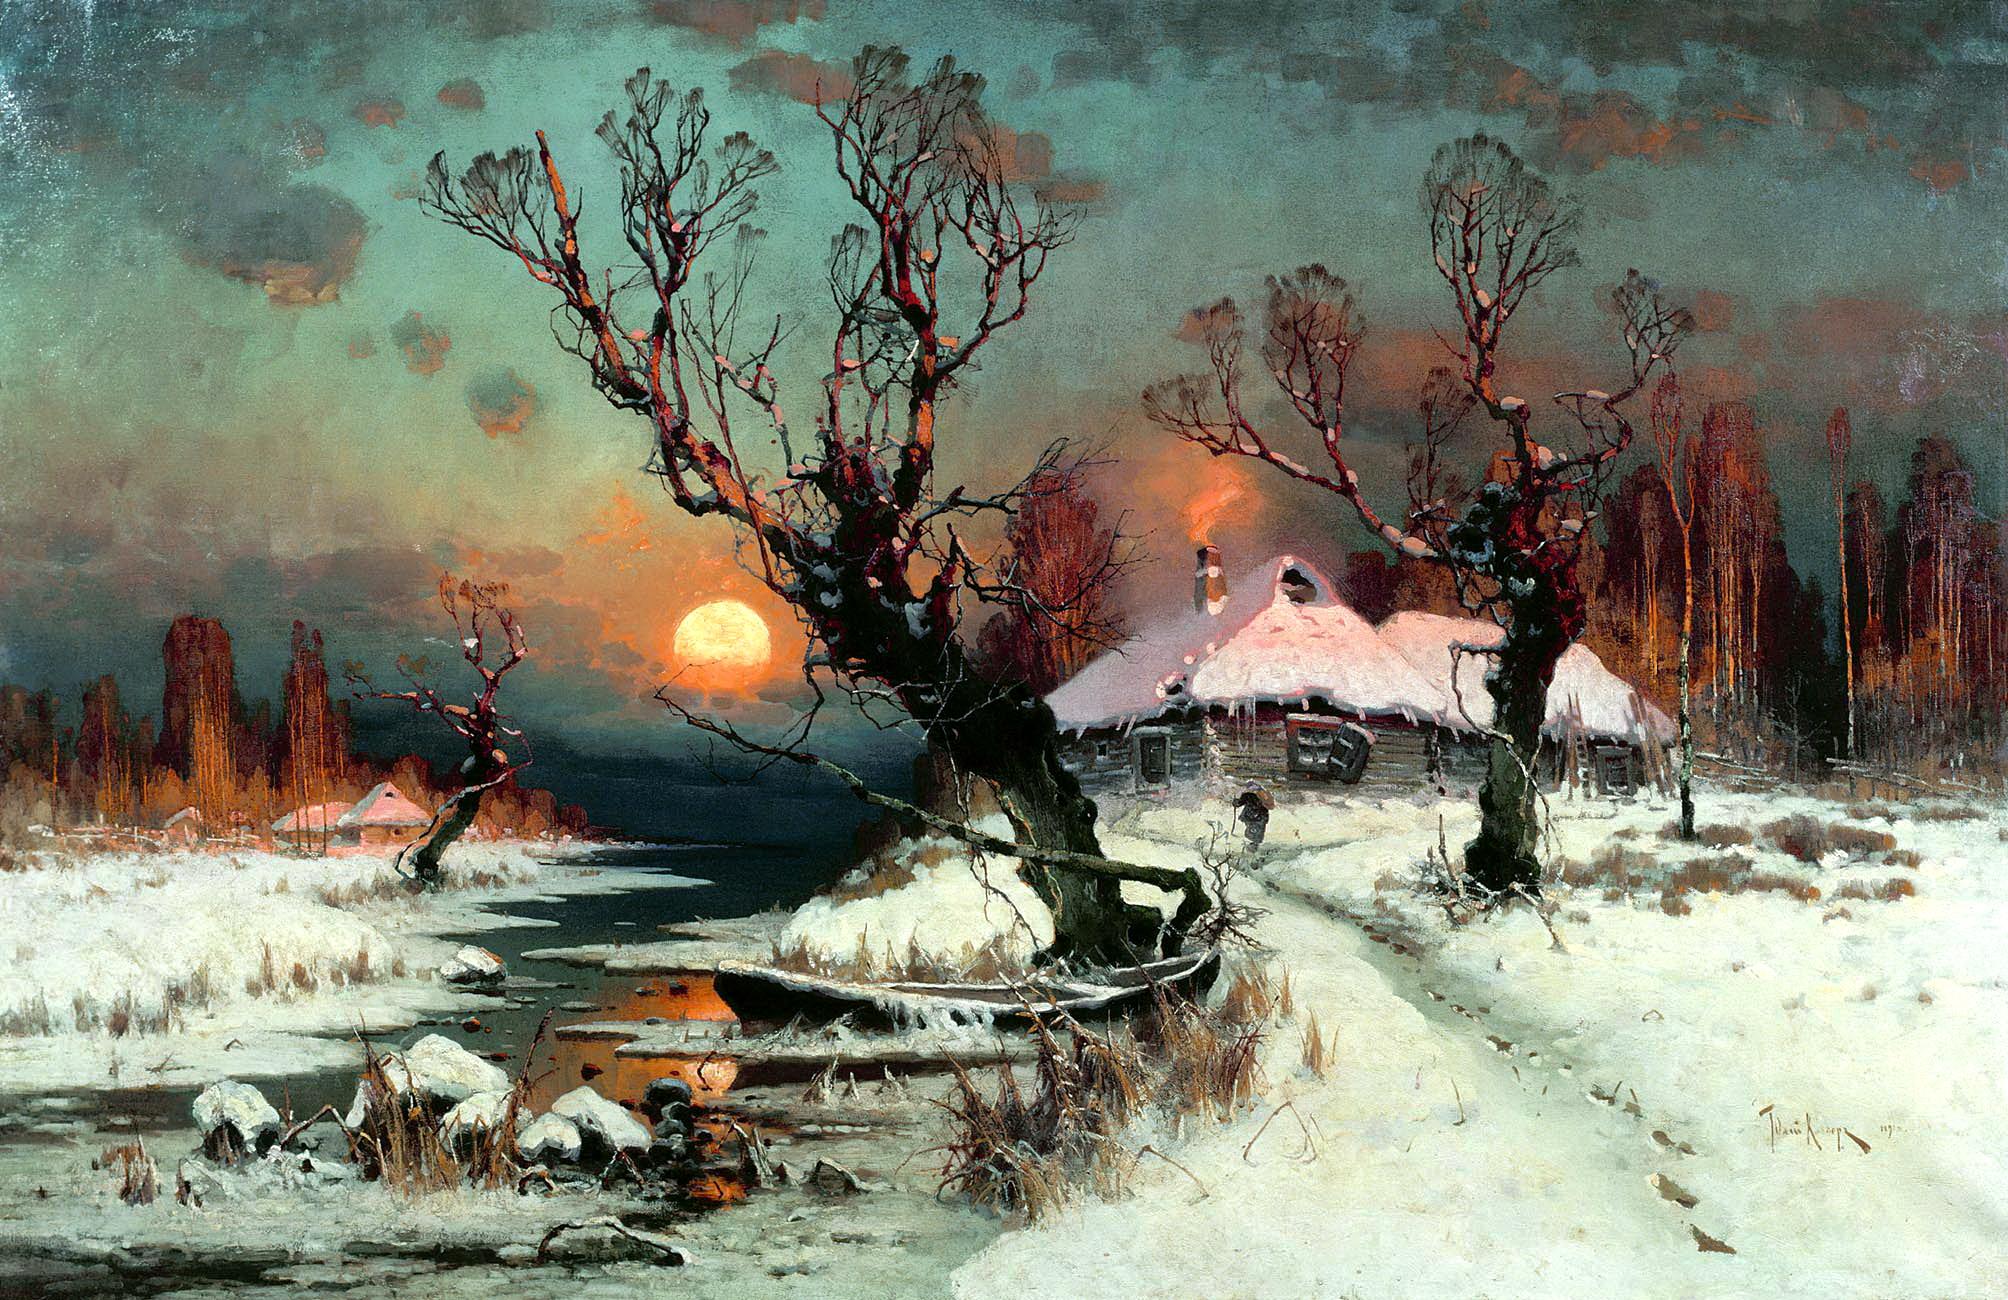 Юлий Клевер картина Закат солнца зимой зимний пейзаж холст масло